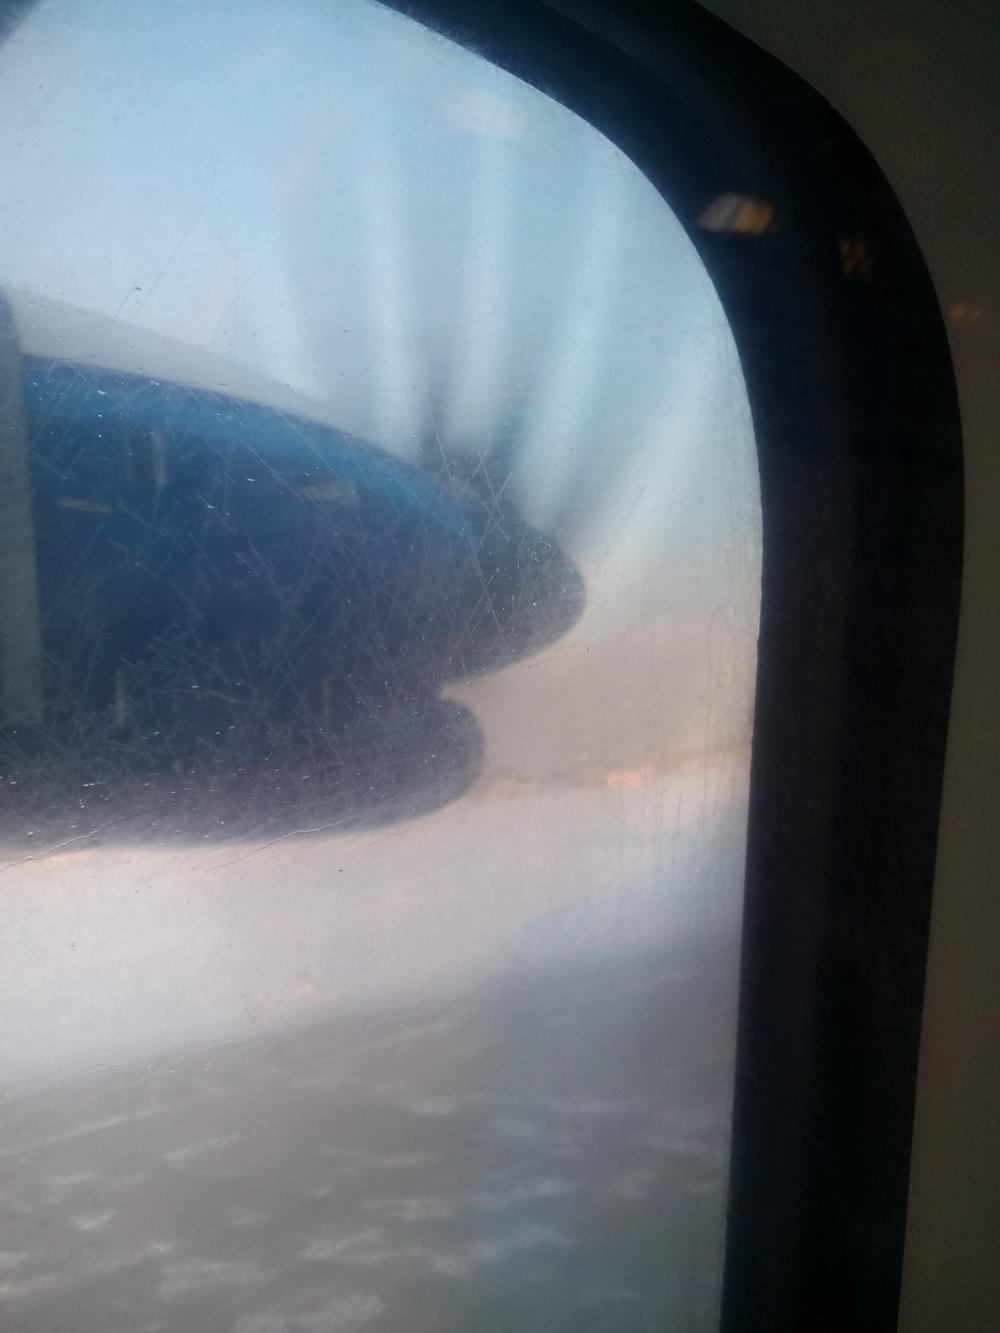 Вот такой винтокрылый самолётик домчал нас до Екатеринбурга.